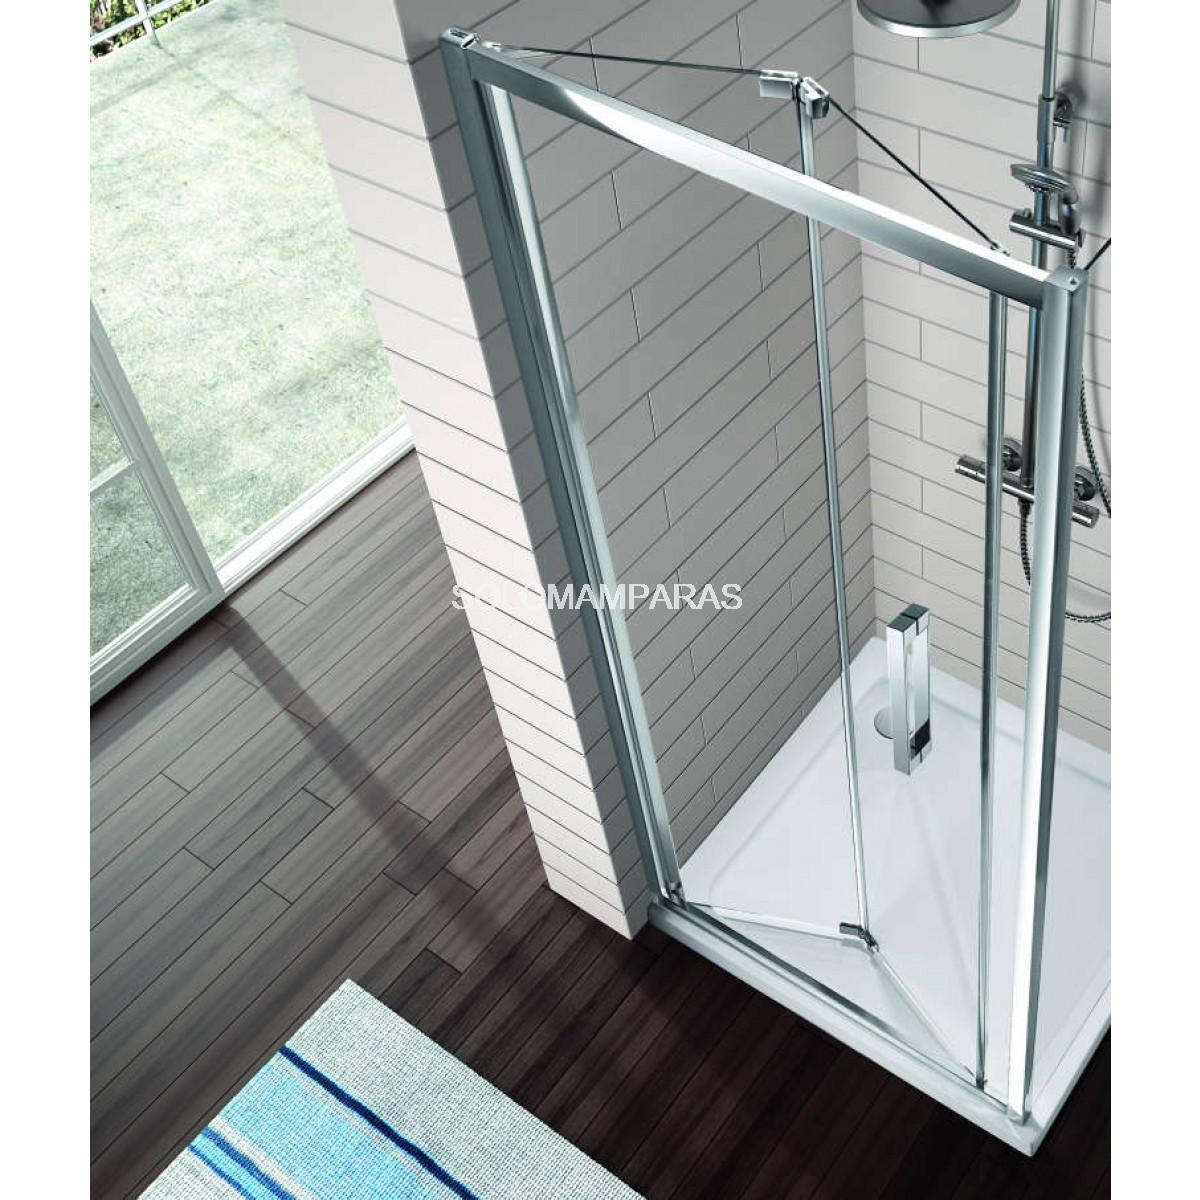 Mampara ducha serie 300 kassandra frontal tr300 - Mampara plegable ducha ...